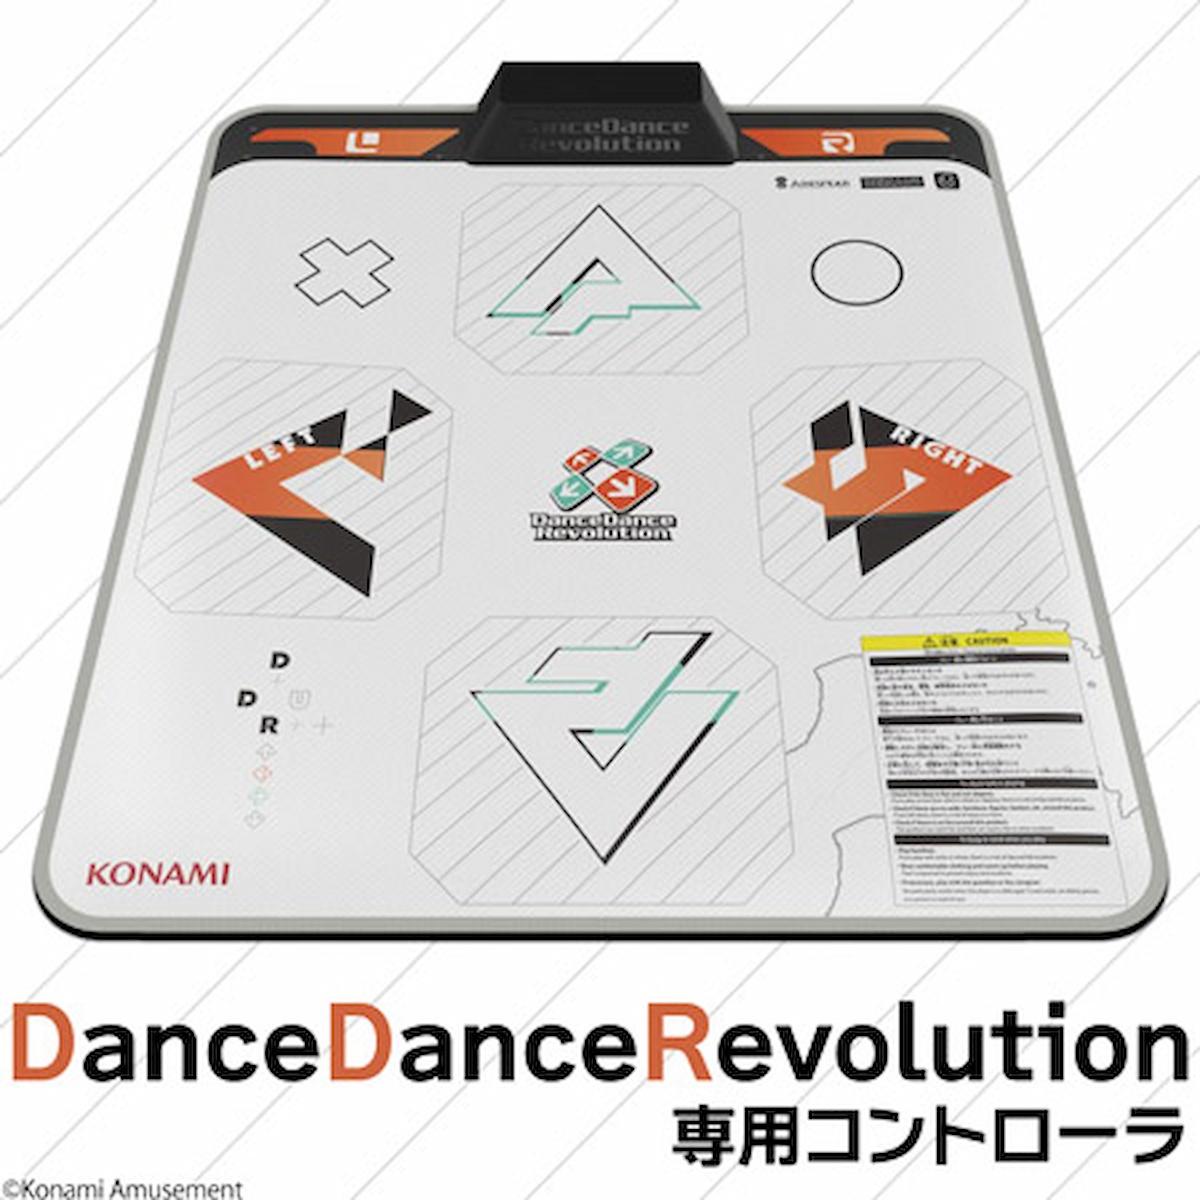 DanceDanceRevolution 専用コントローラ